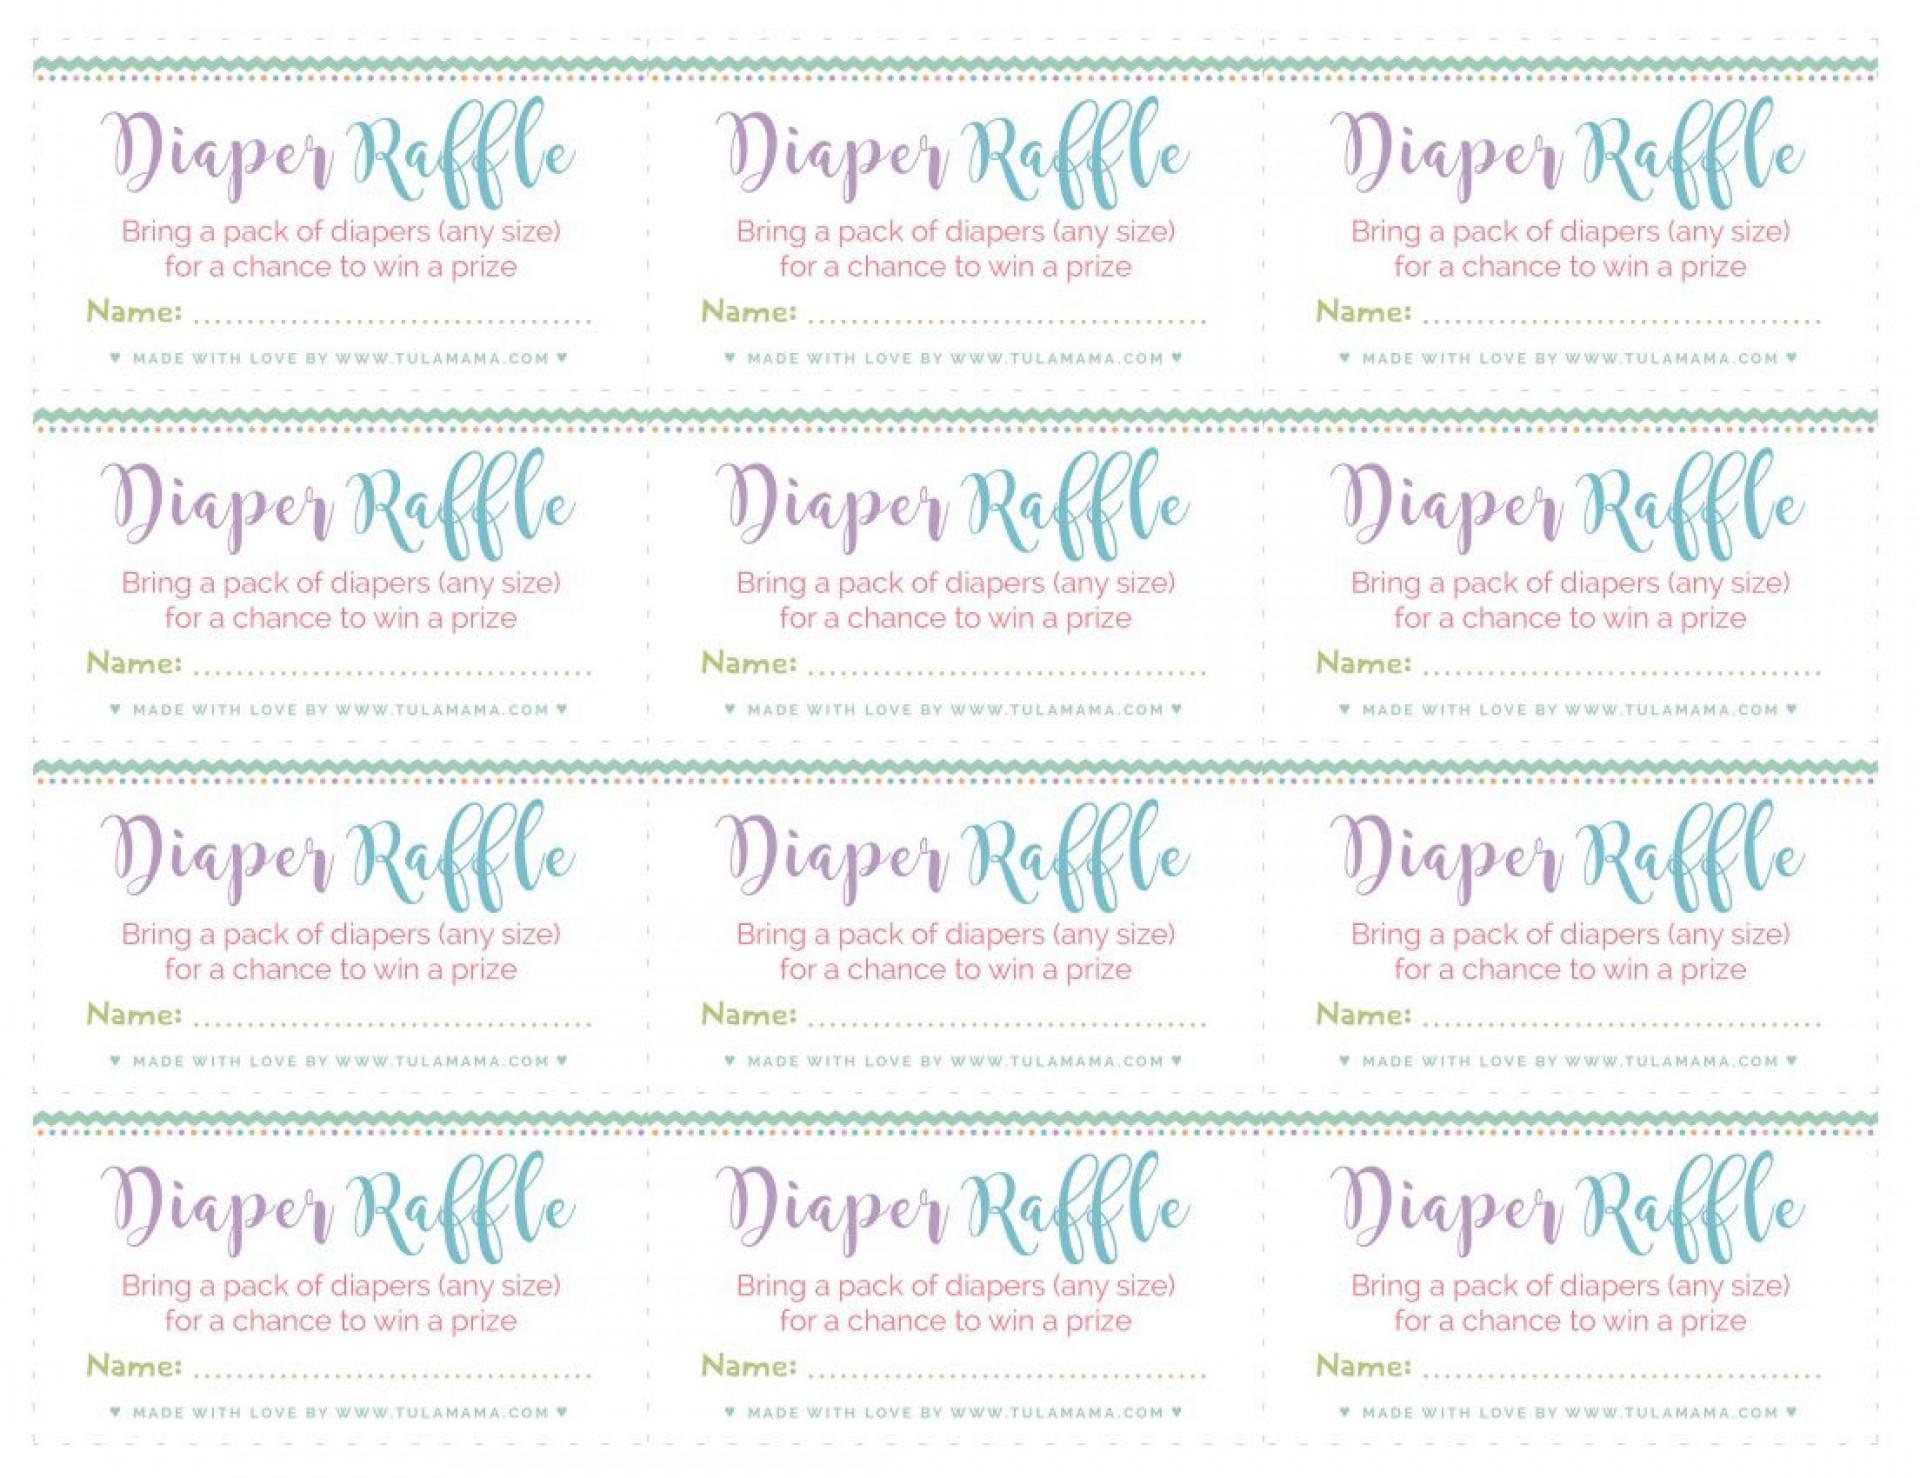 003 Rare Diaper Raffle Ticket Template High Def  Boy Free Printable Print Black And White1920